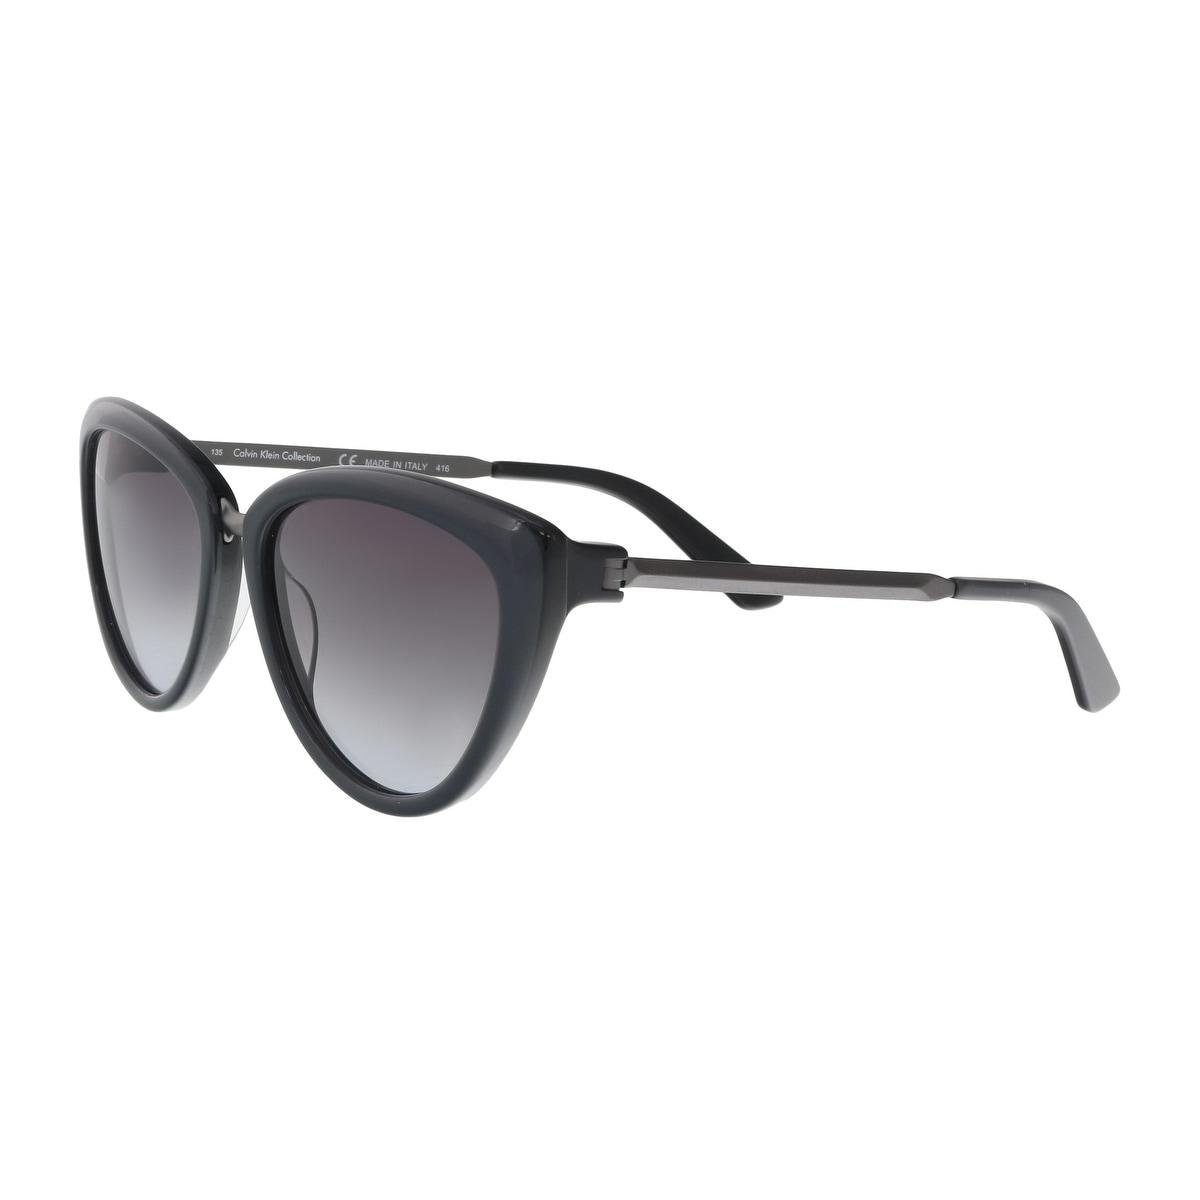 664bec560f Shop Calvin Klein CK8538S 059 Jet Black Cat Eye Sunglasses - 56-17 ...